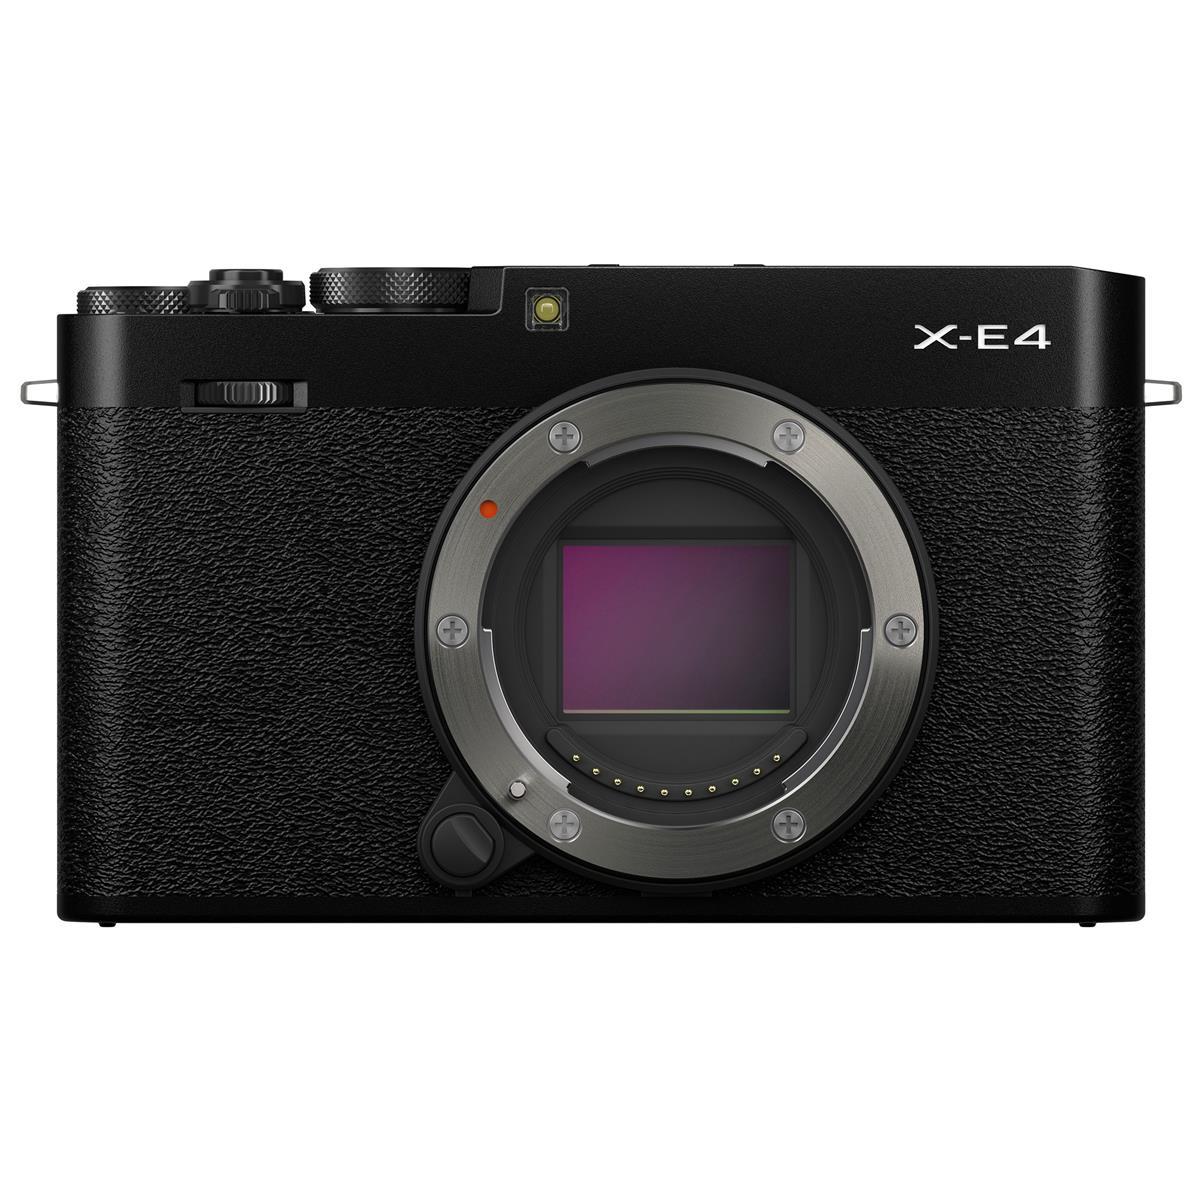 Fujifilm X-E4 Mirrorless Camera Body (Black)